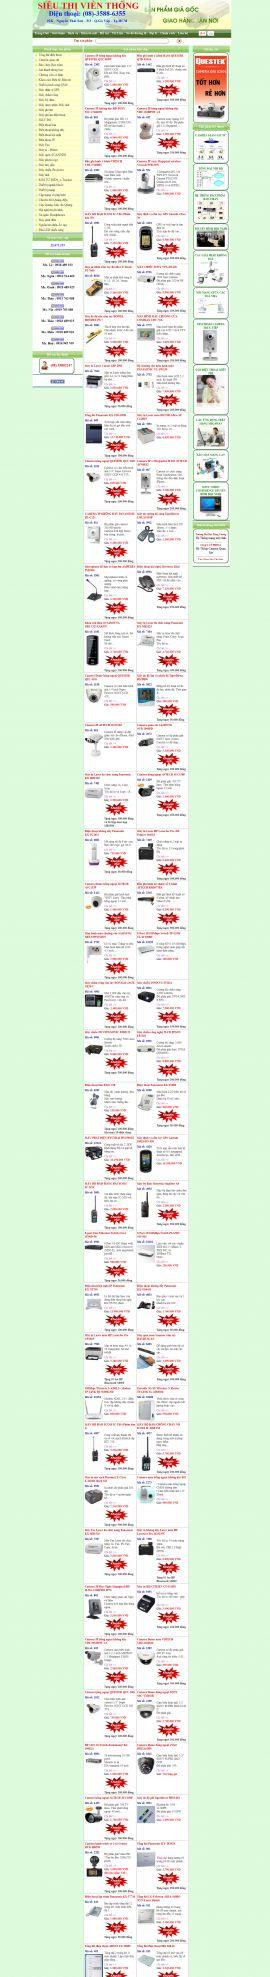 Mẫu website siêu thị 10308